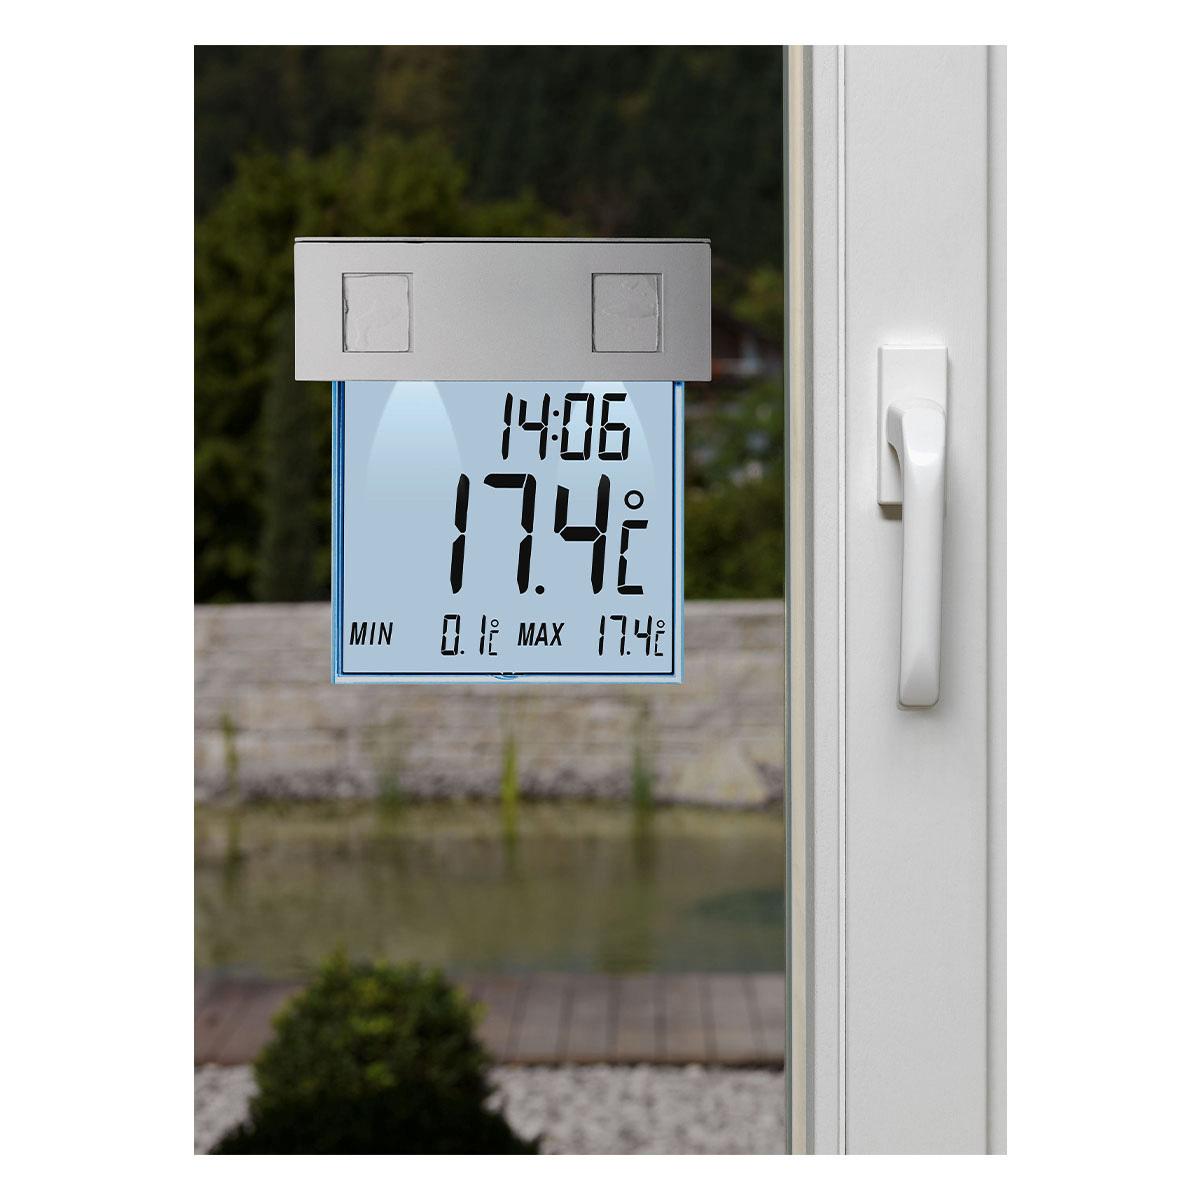 30-1035-digitales-fensterthermometer-mit-solarbeleuchtung-vision-solar-anwendung-1200x1200px.jpg